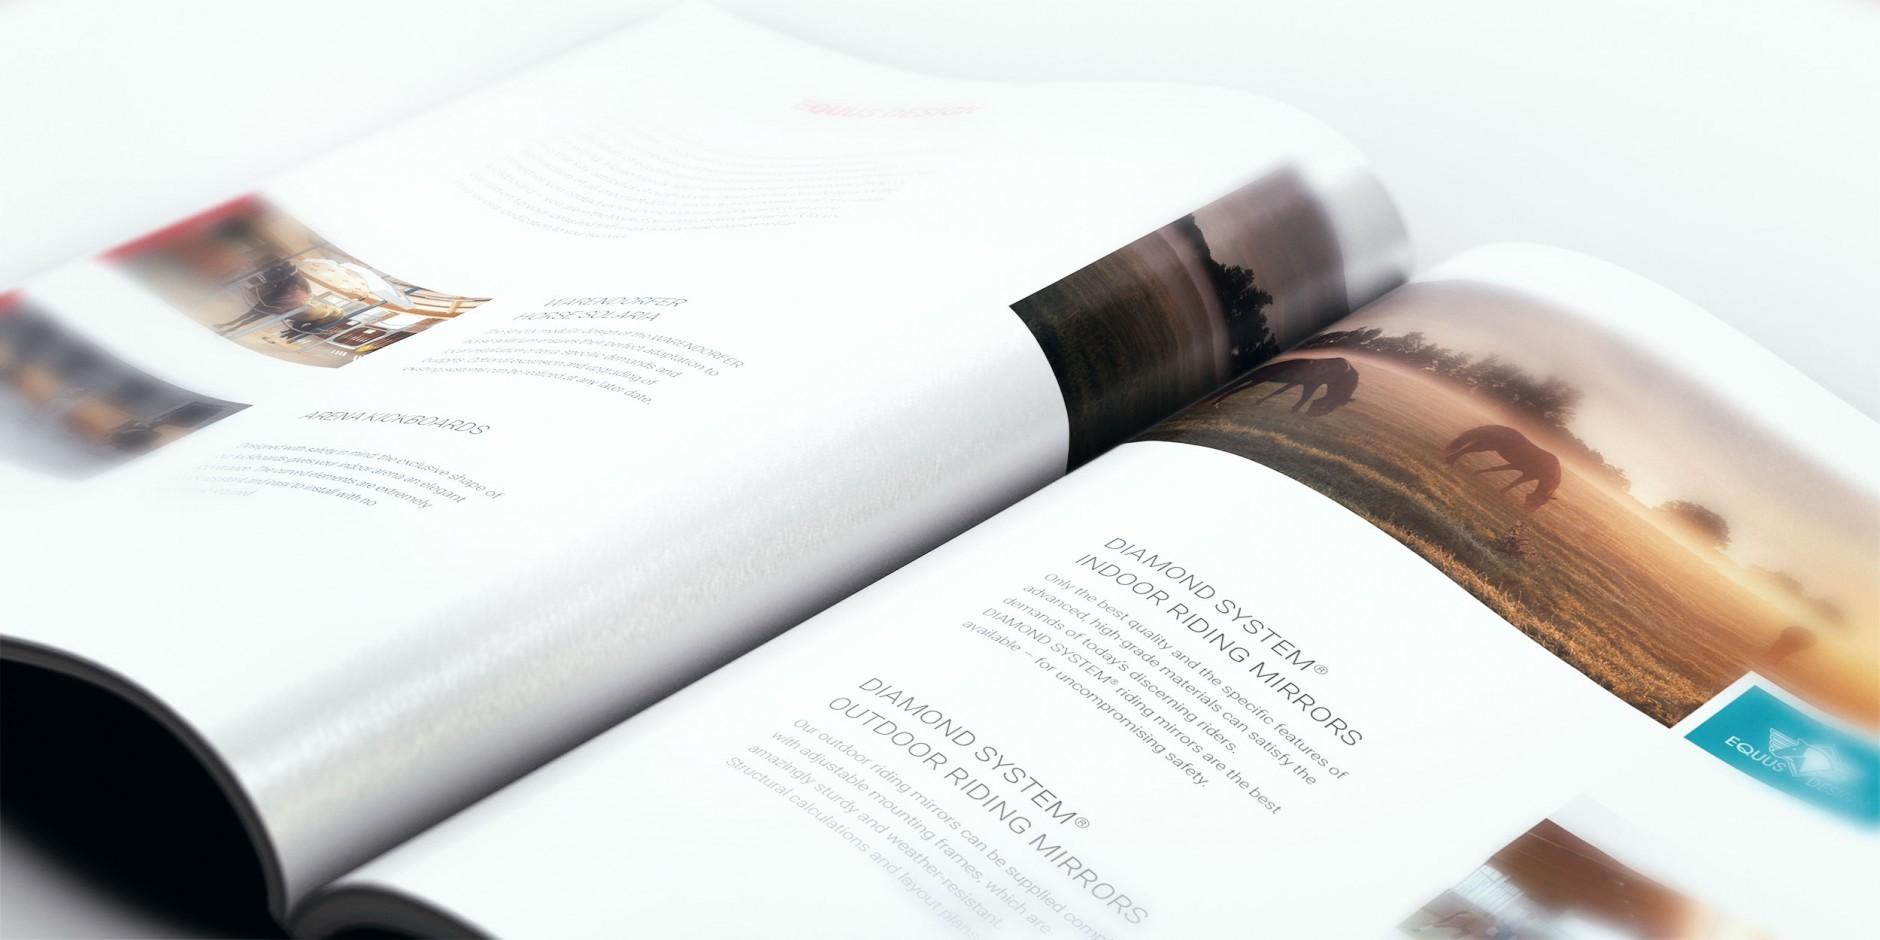 mediensturm_bacher-equus-design-magazin_1-001